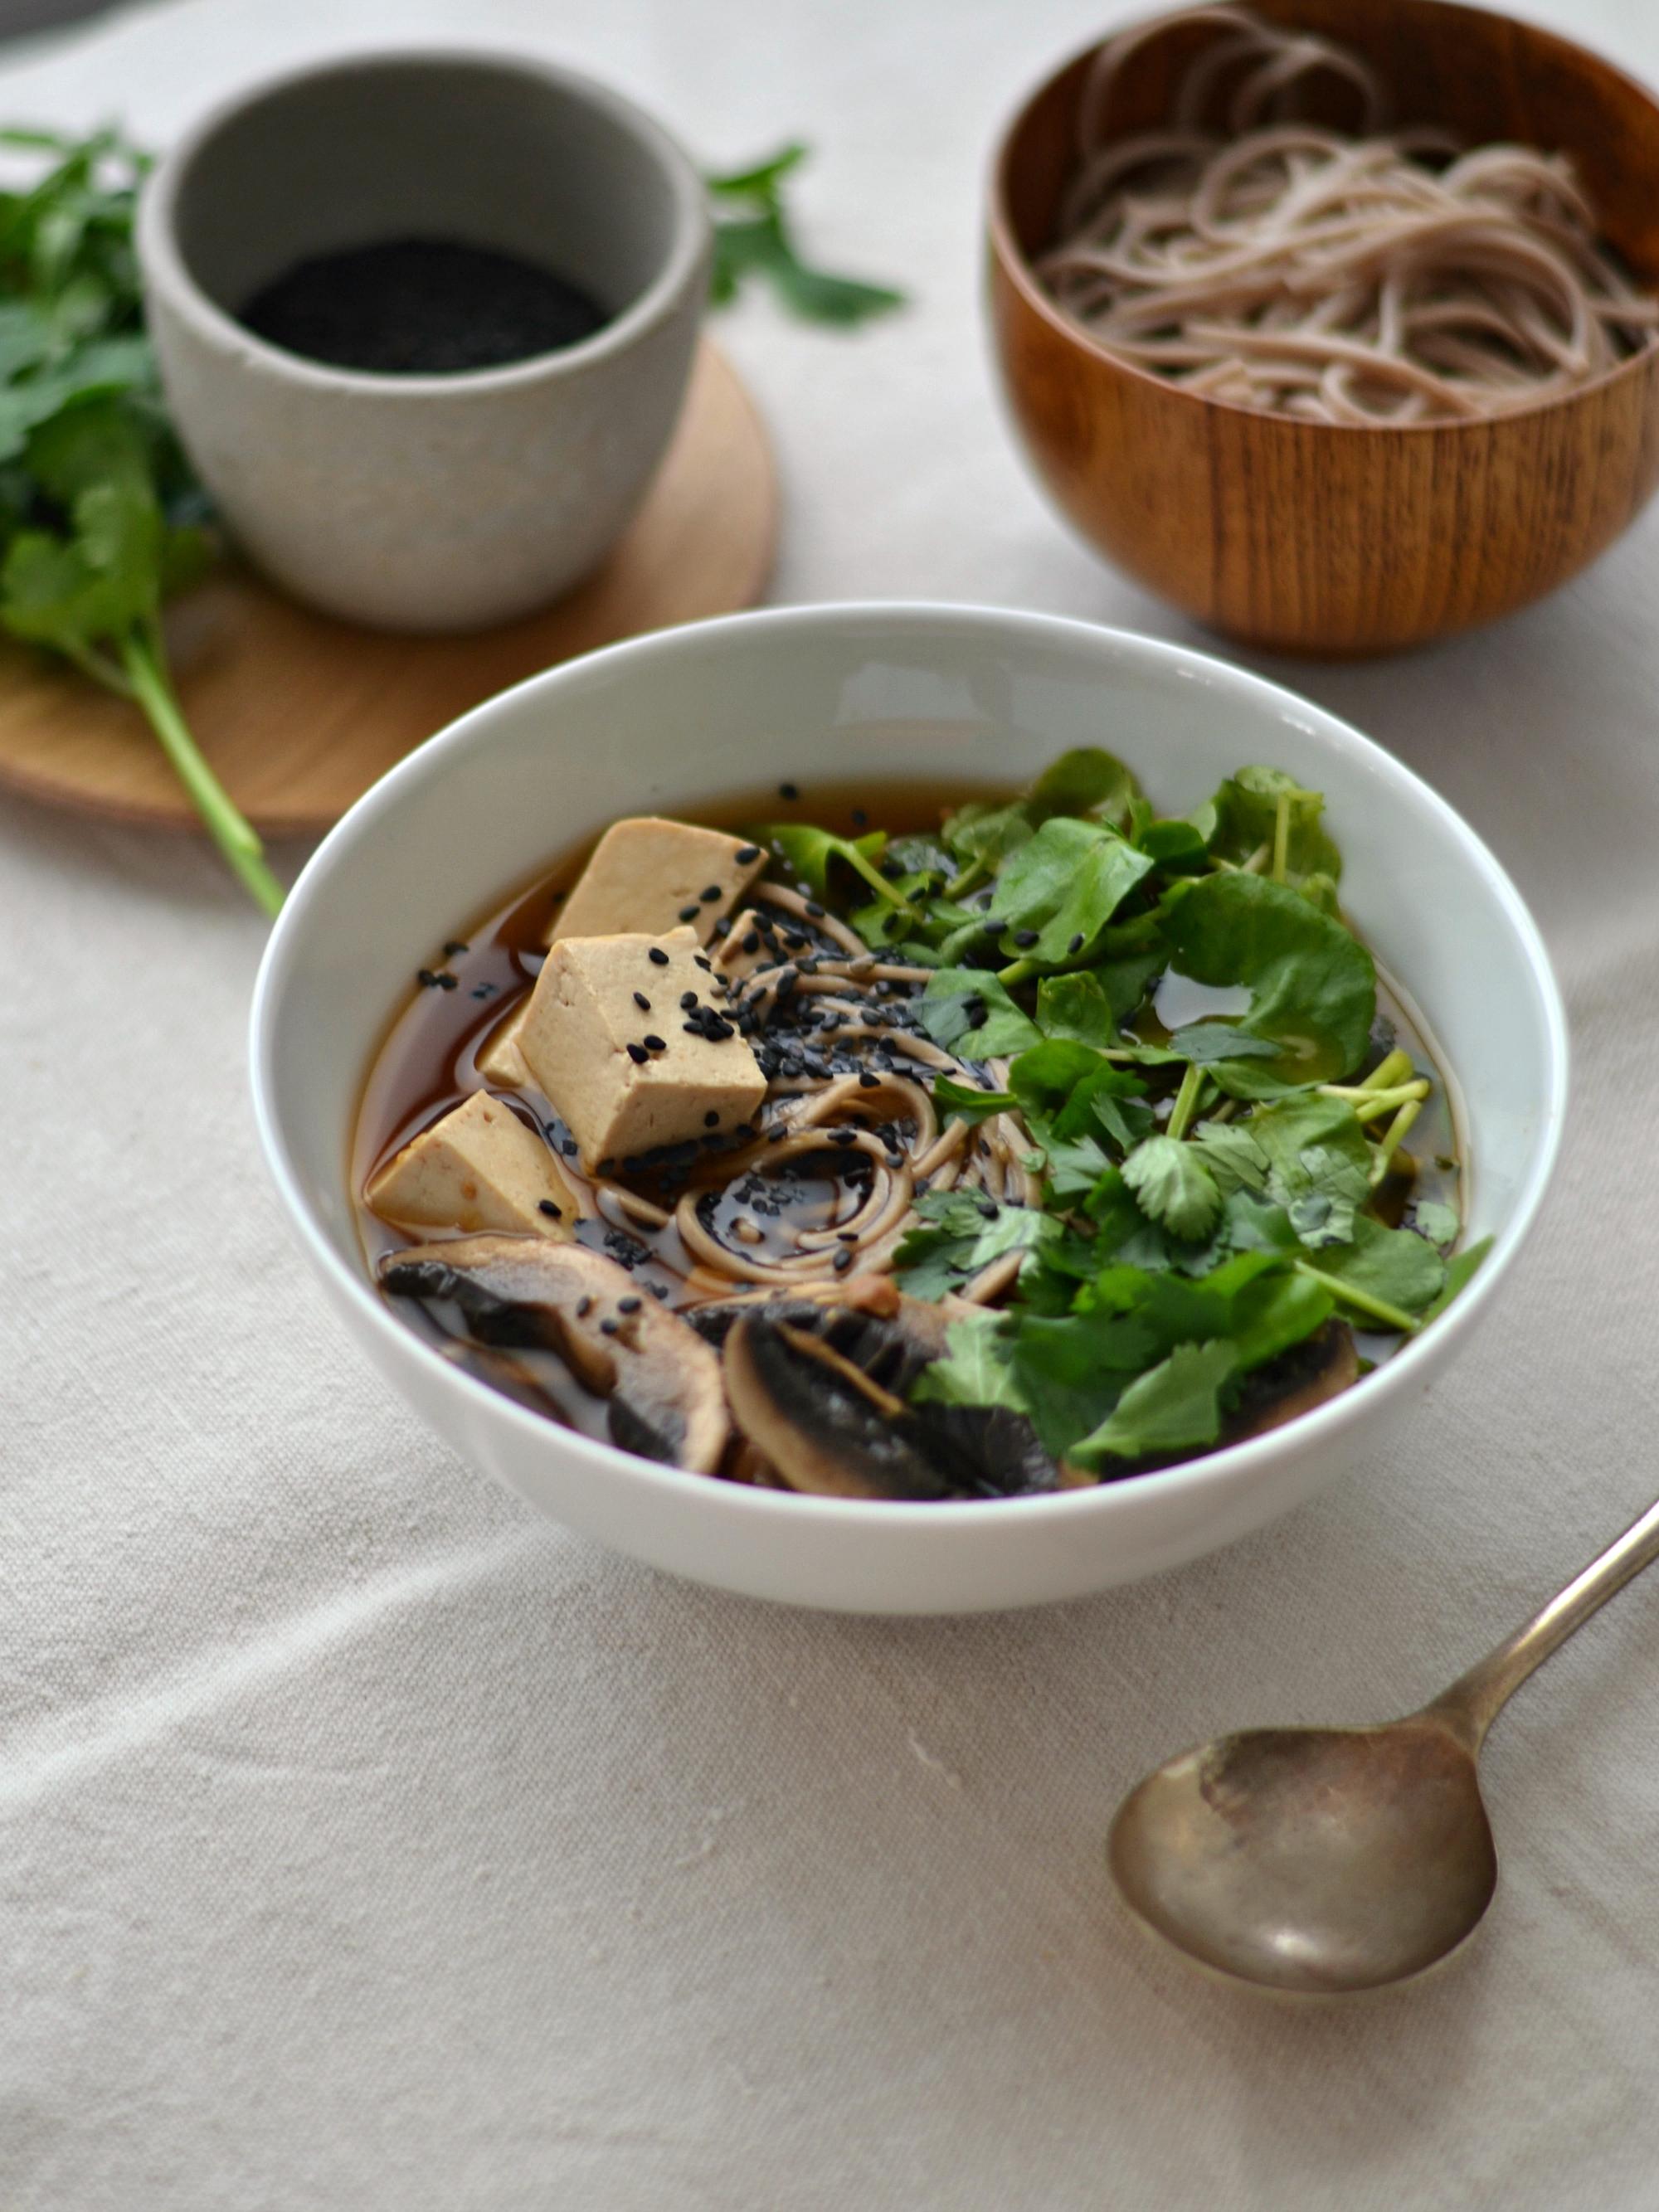 Compassionate Cuisine - Receitas vegetarianas - Sopa de Miso